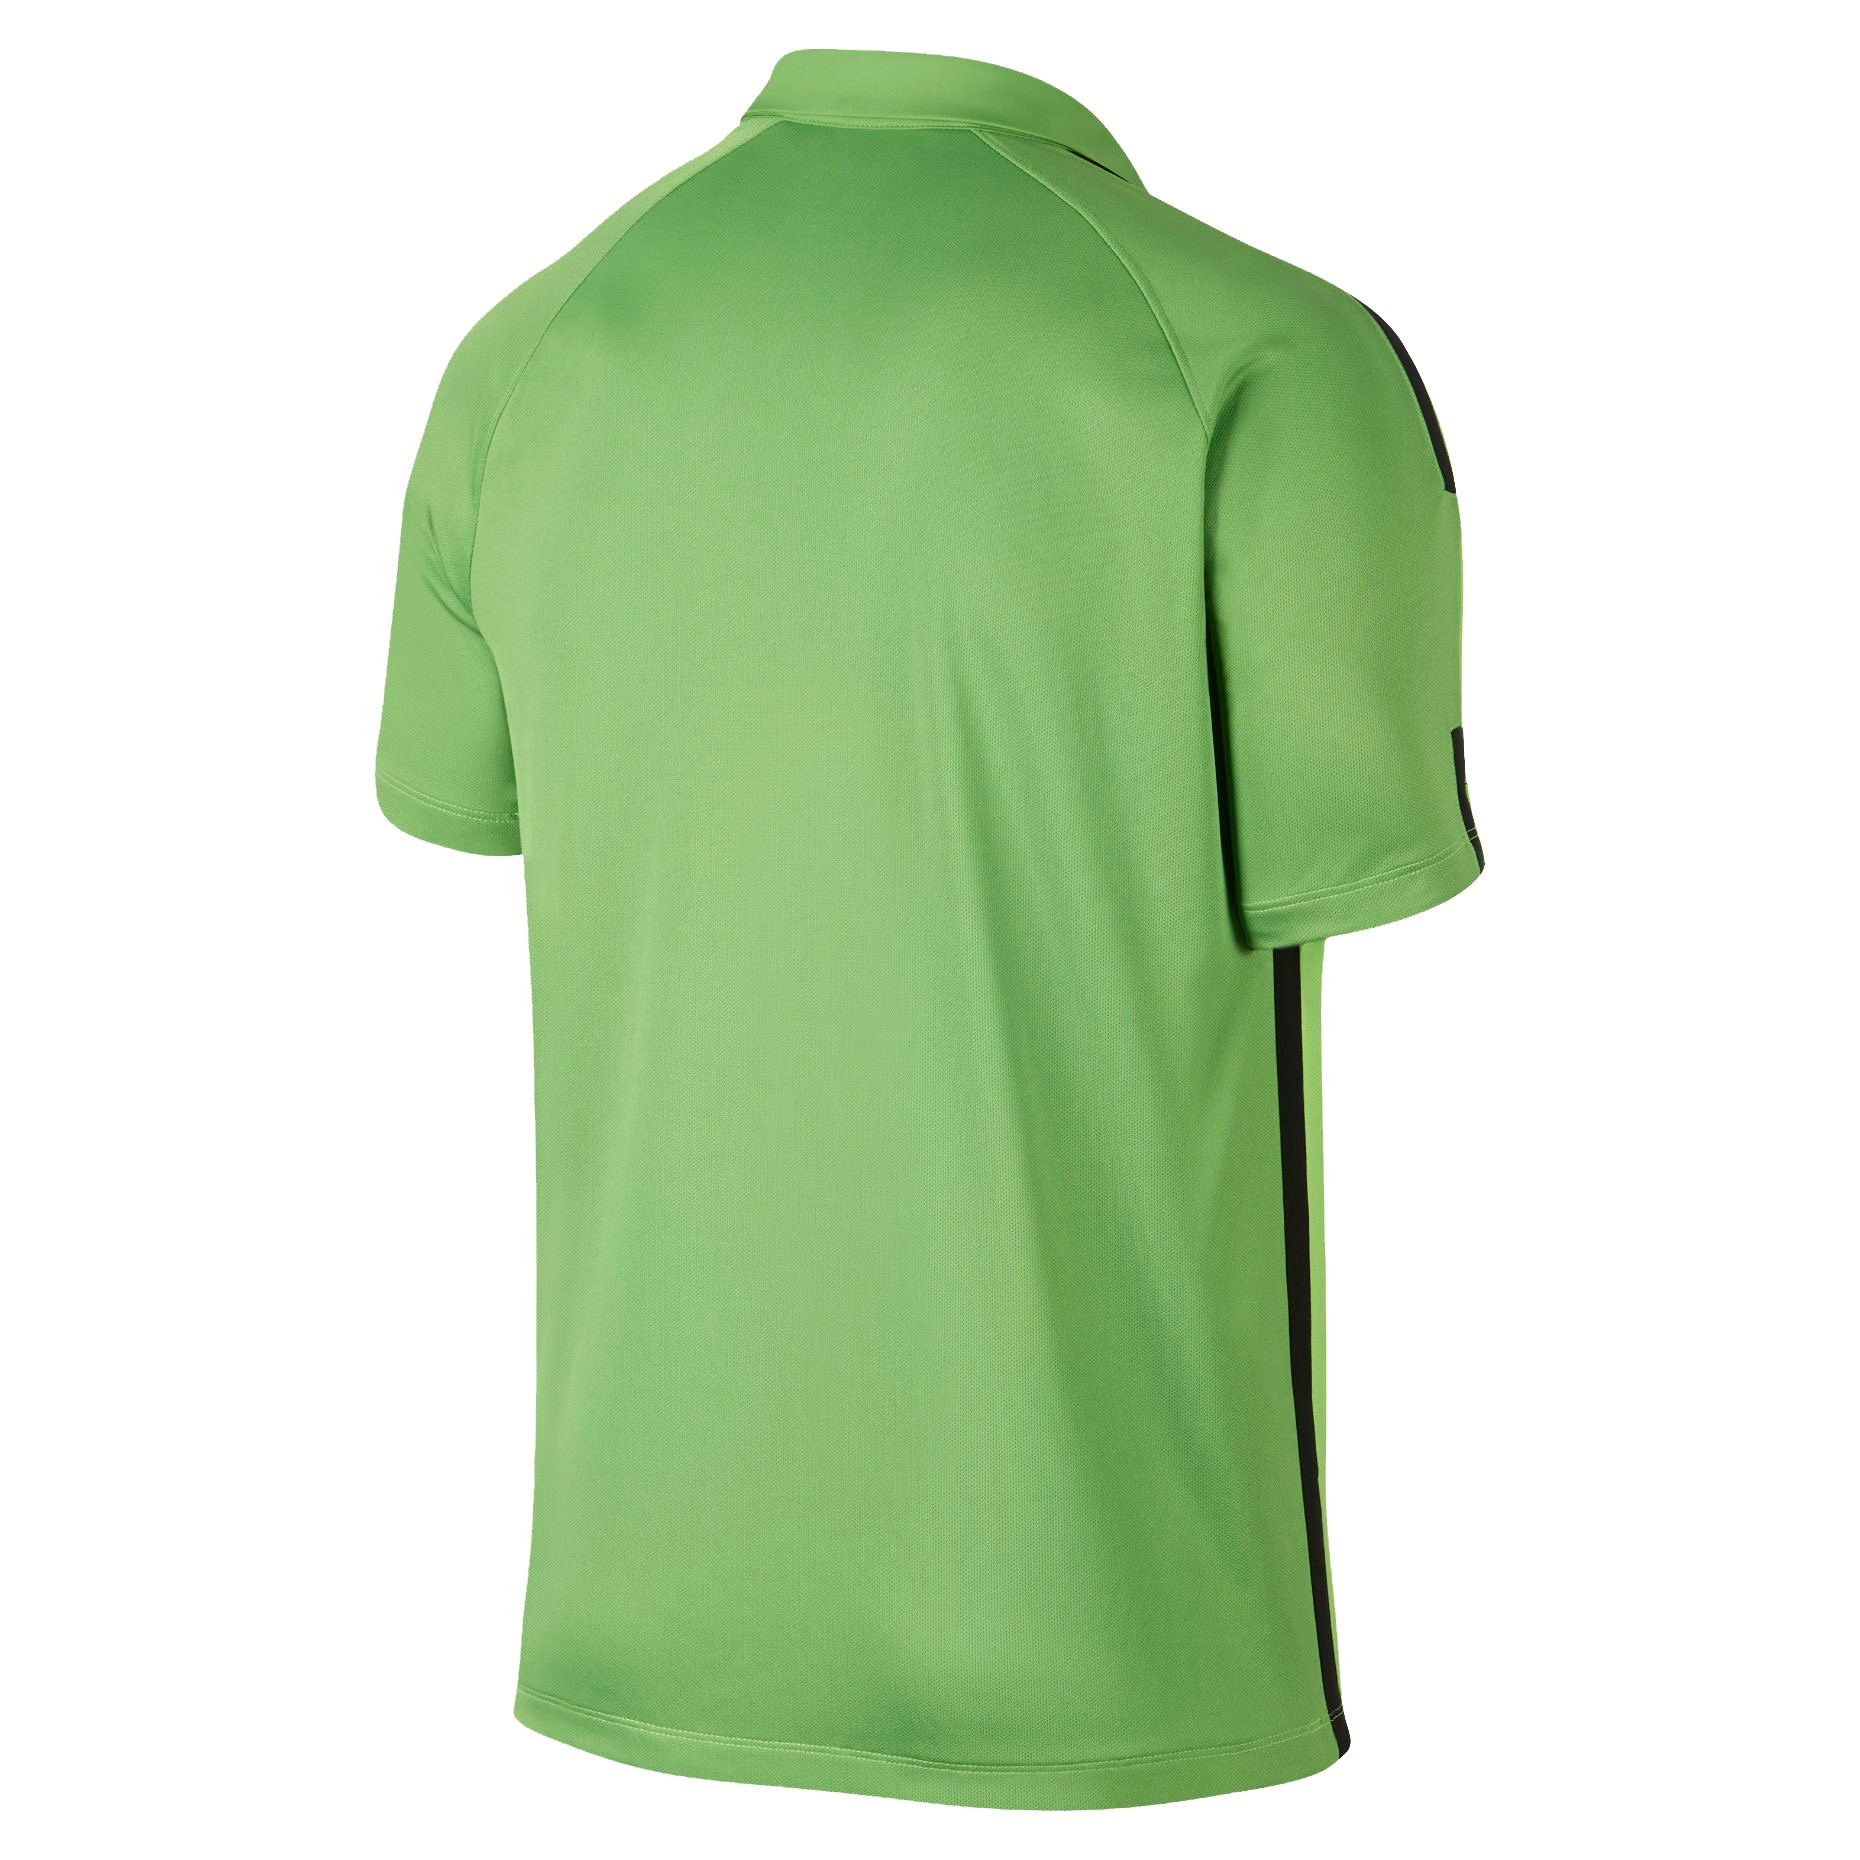 2014-2015 Juventus Third Nike Football Shirt (Kids)  50808  -  39.68  Teamzo.com 0ba664b81